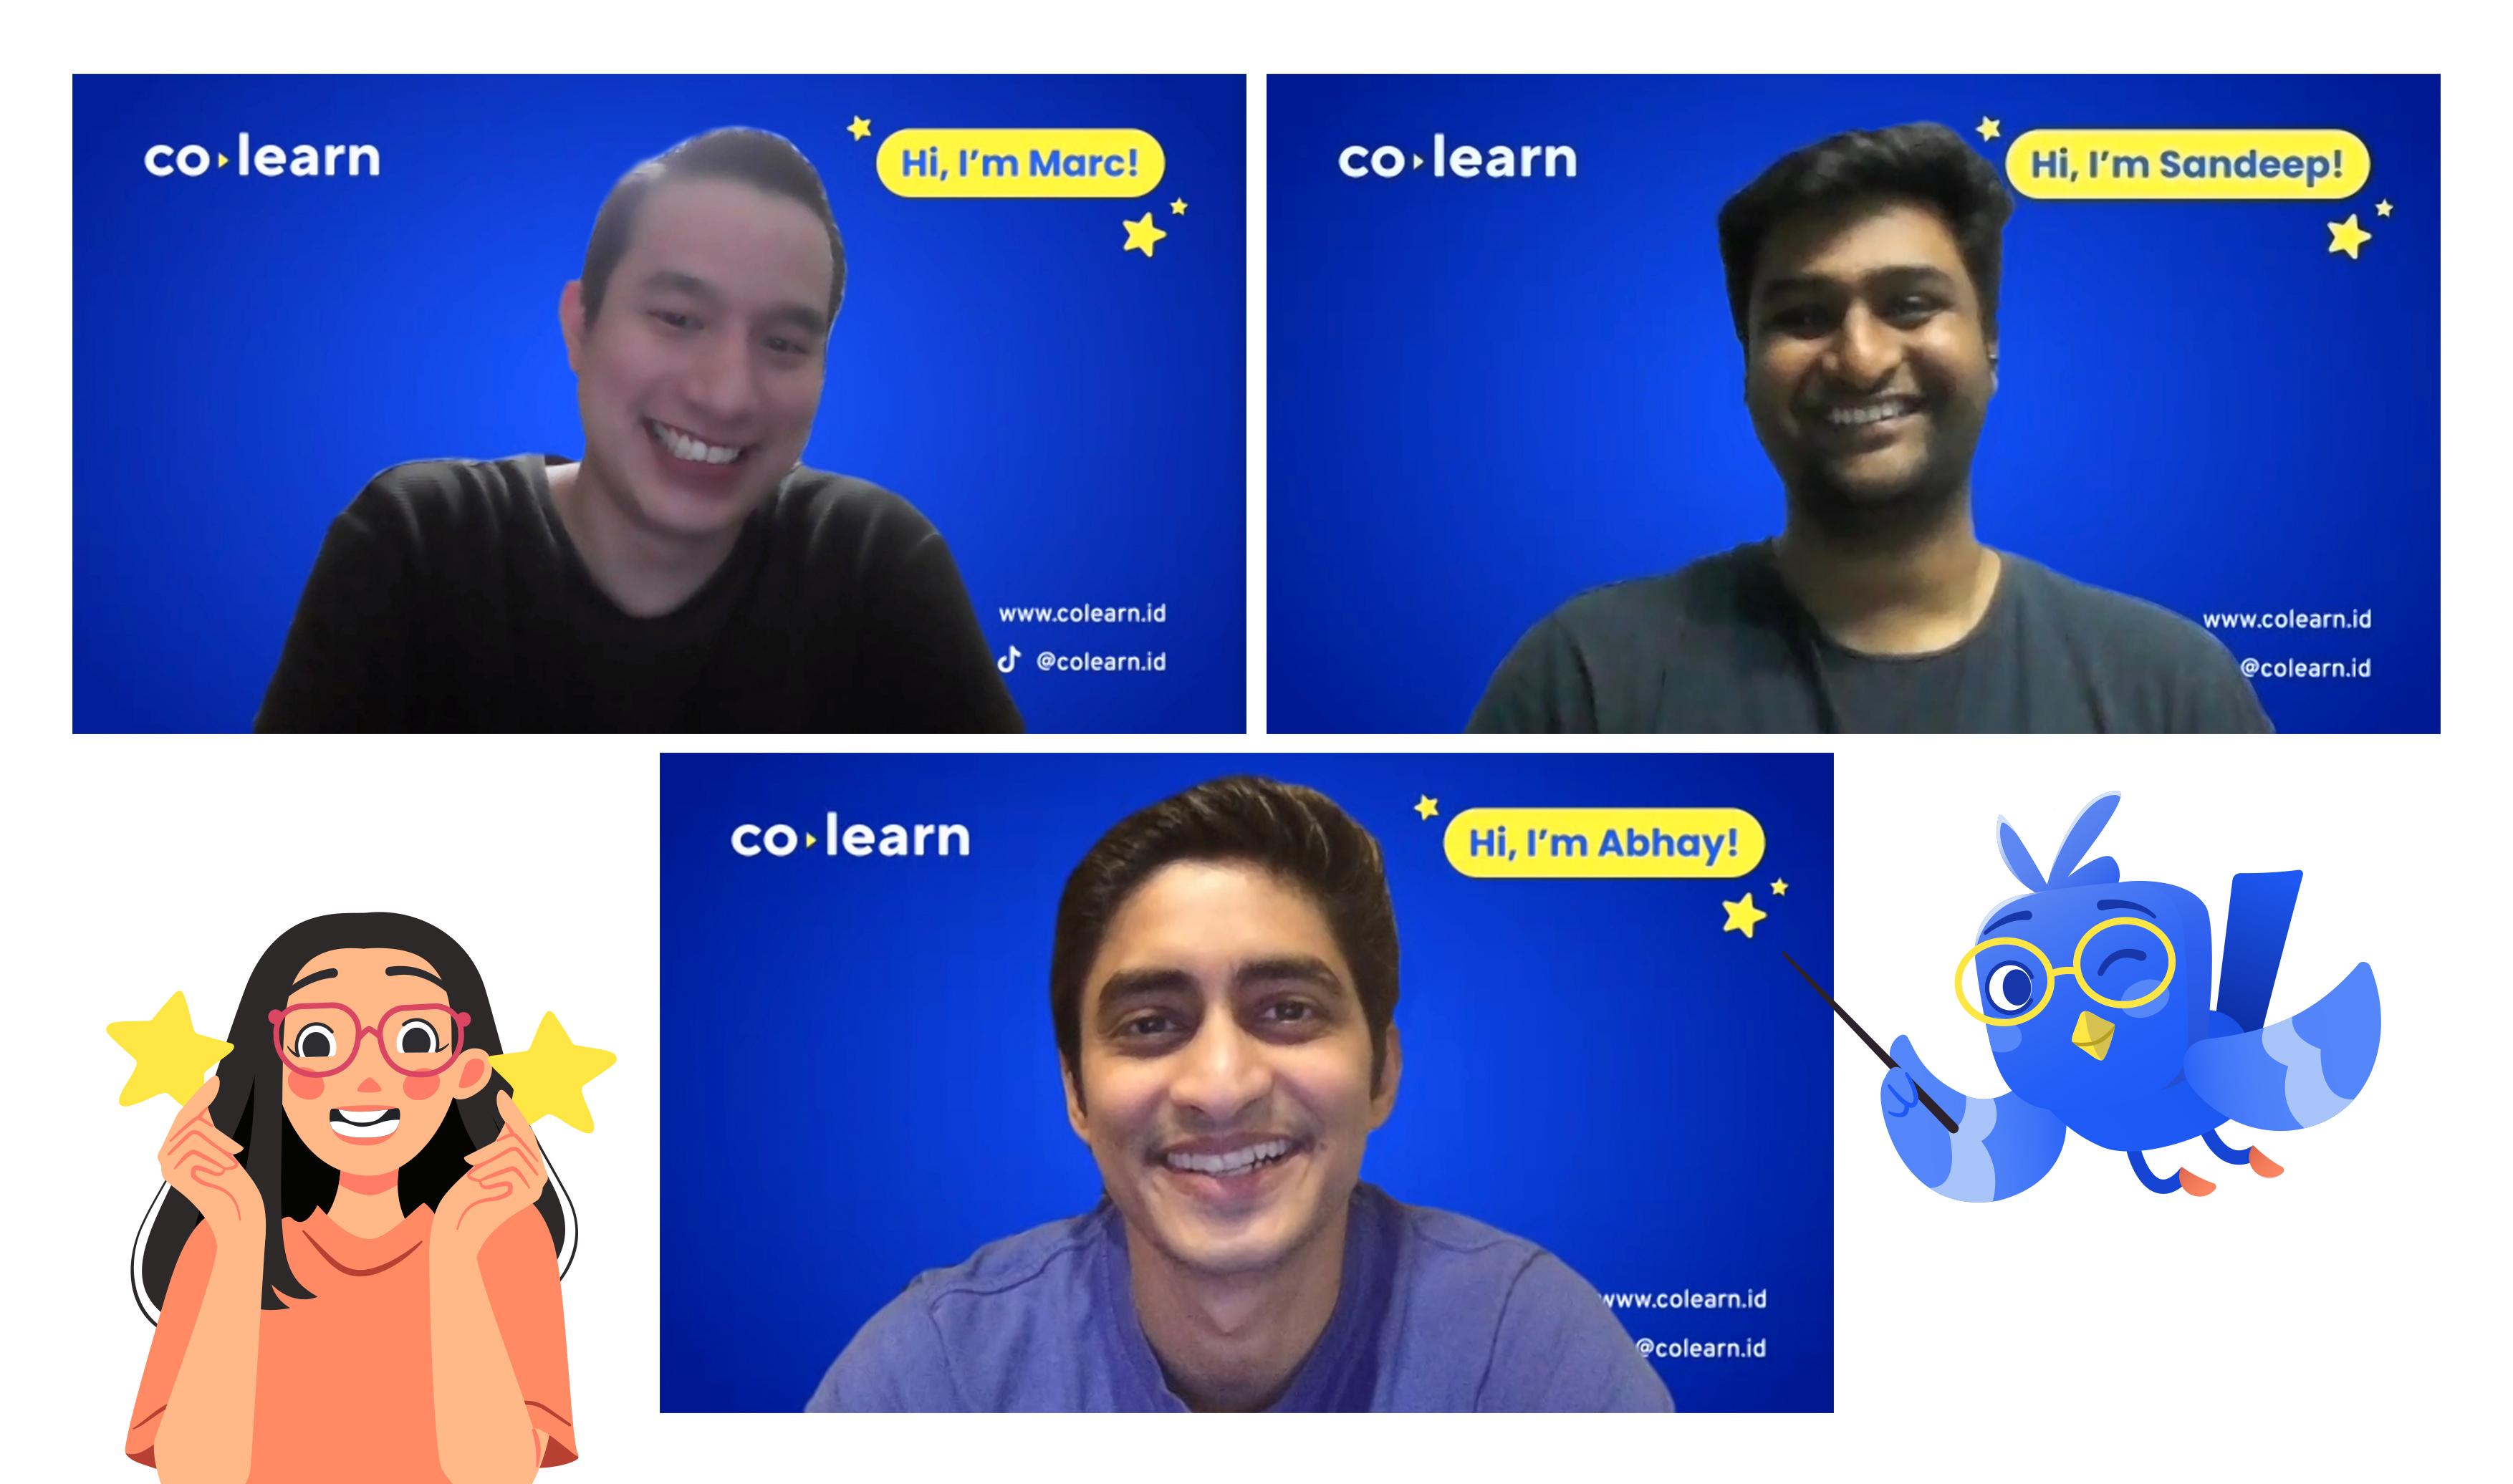 A Zoom screenshot with CoLearn's founding crew: Marc Irawan, Abhay Saboo and Sandeep Devaram